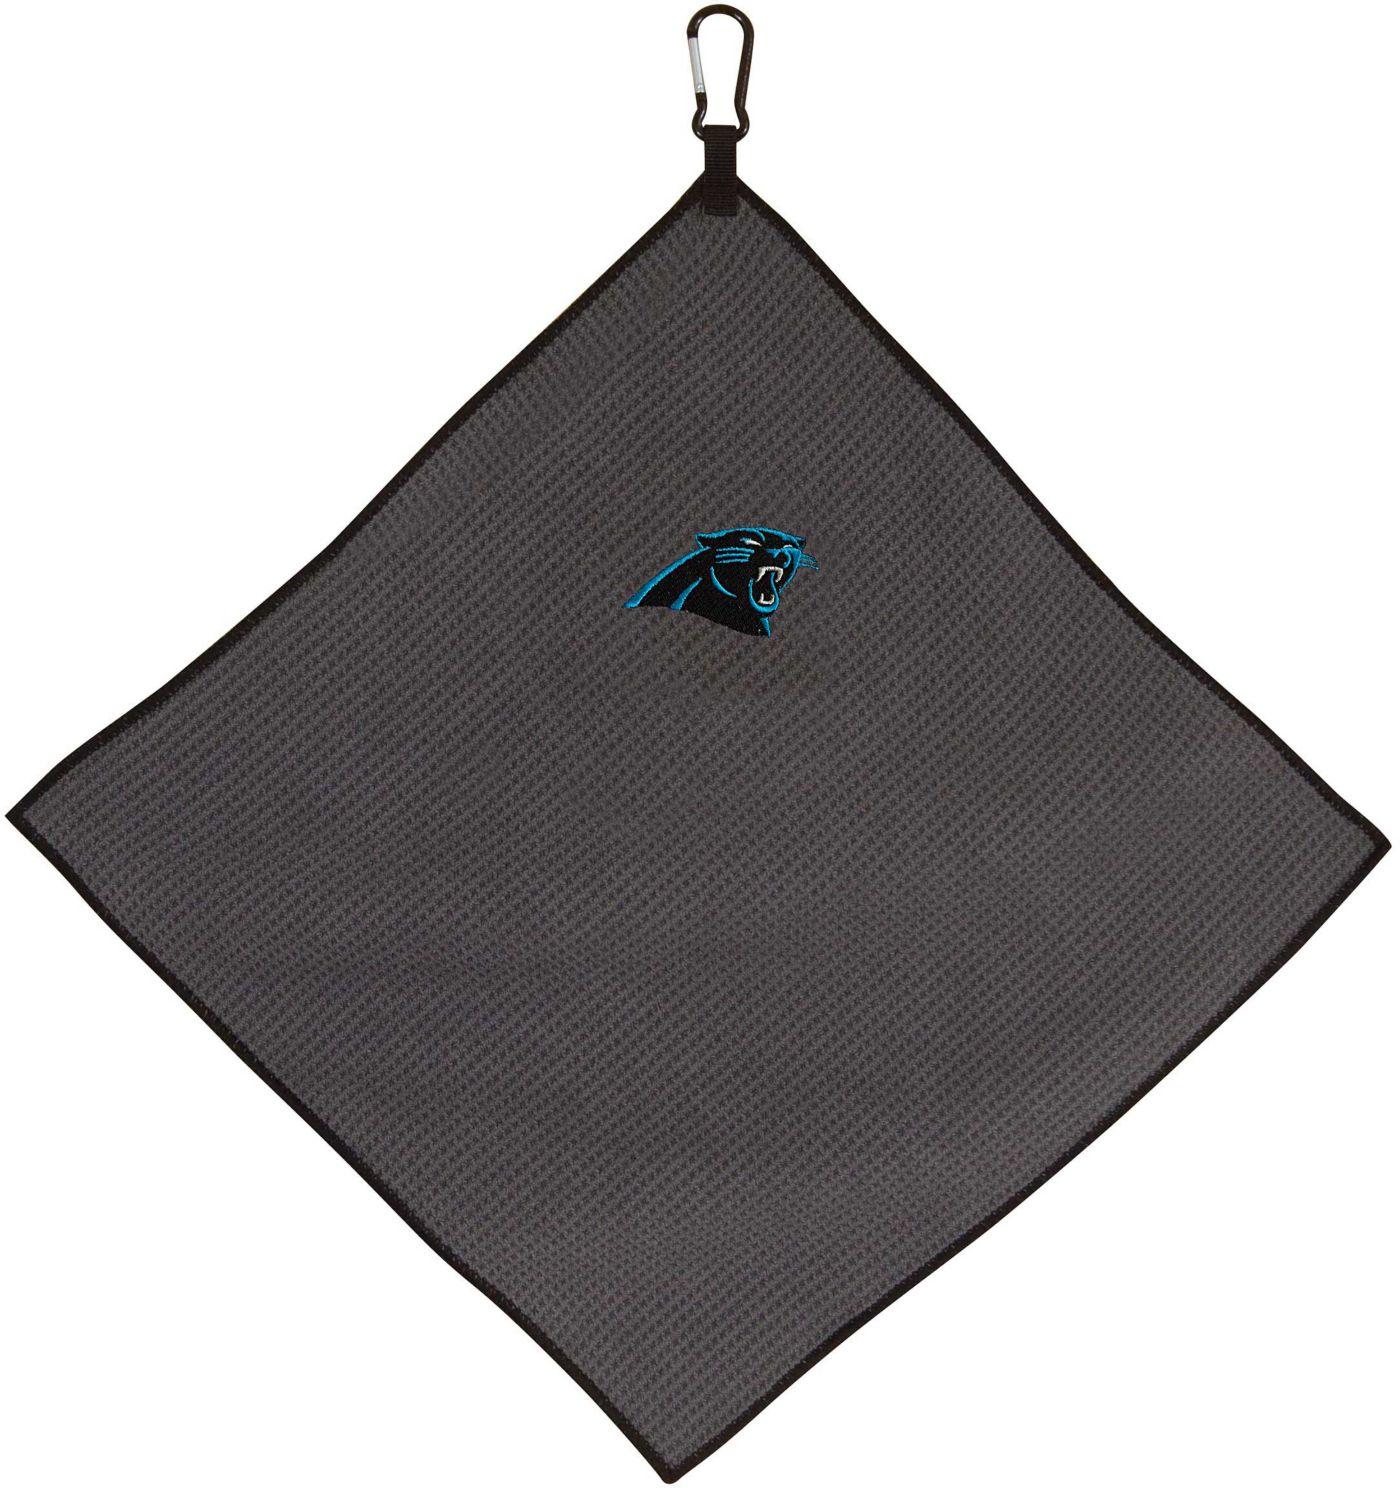 "Team Effort Carolina Panthers 15"" x 15"" Microfiber Golf Towel"